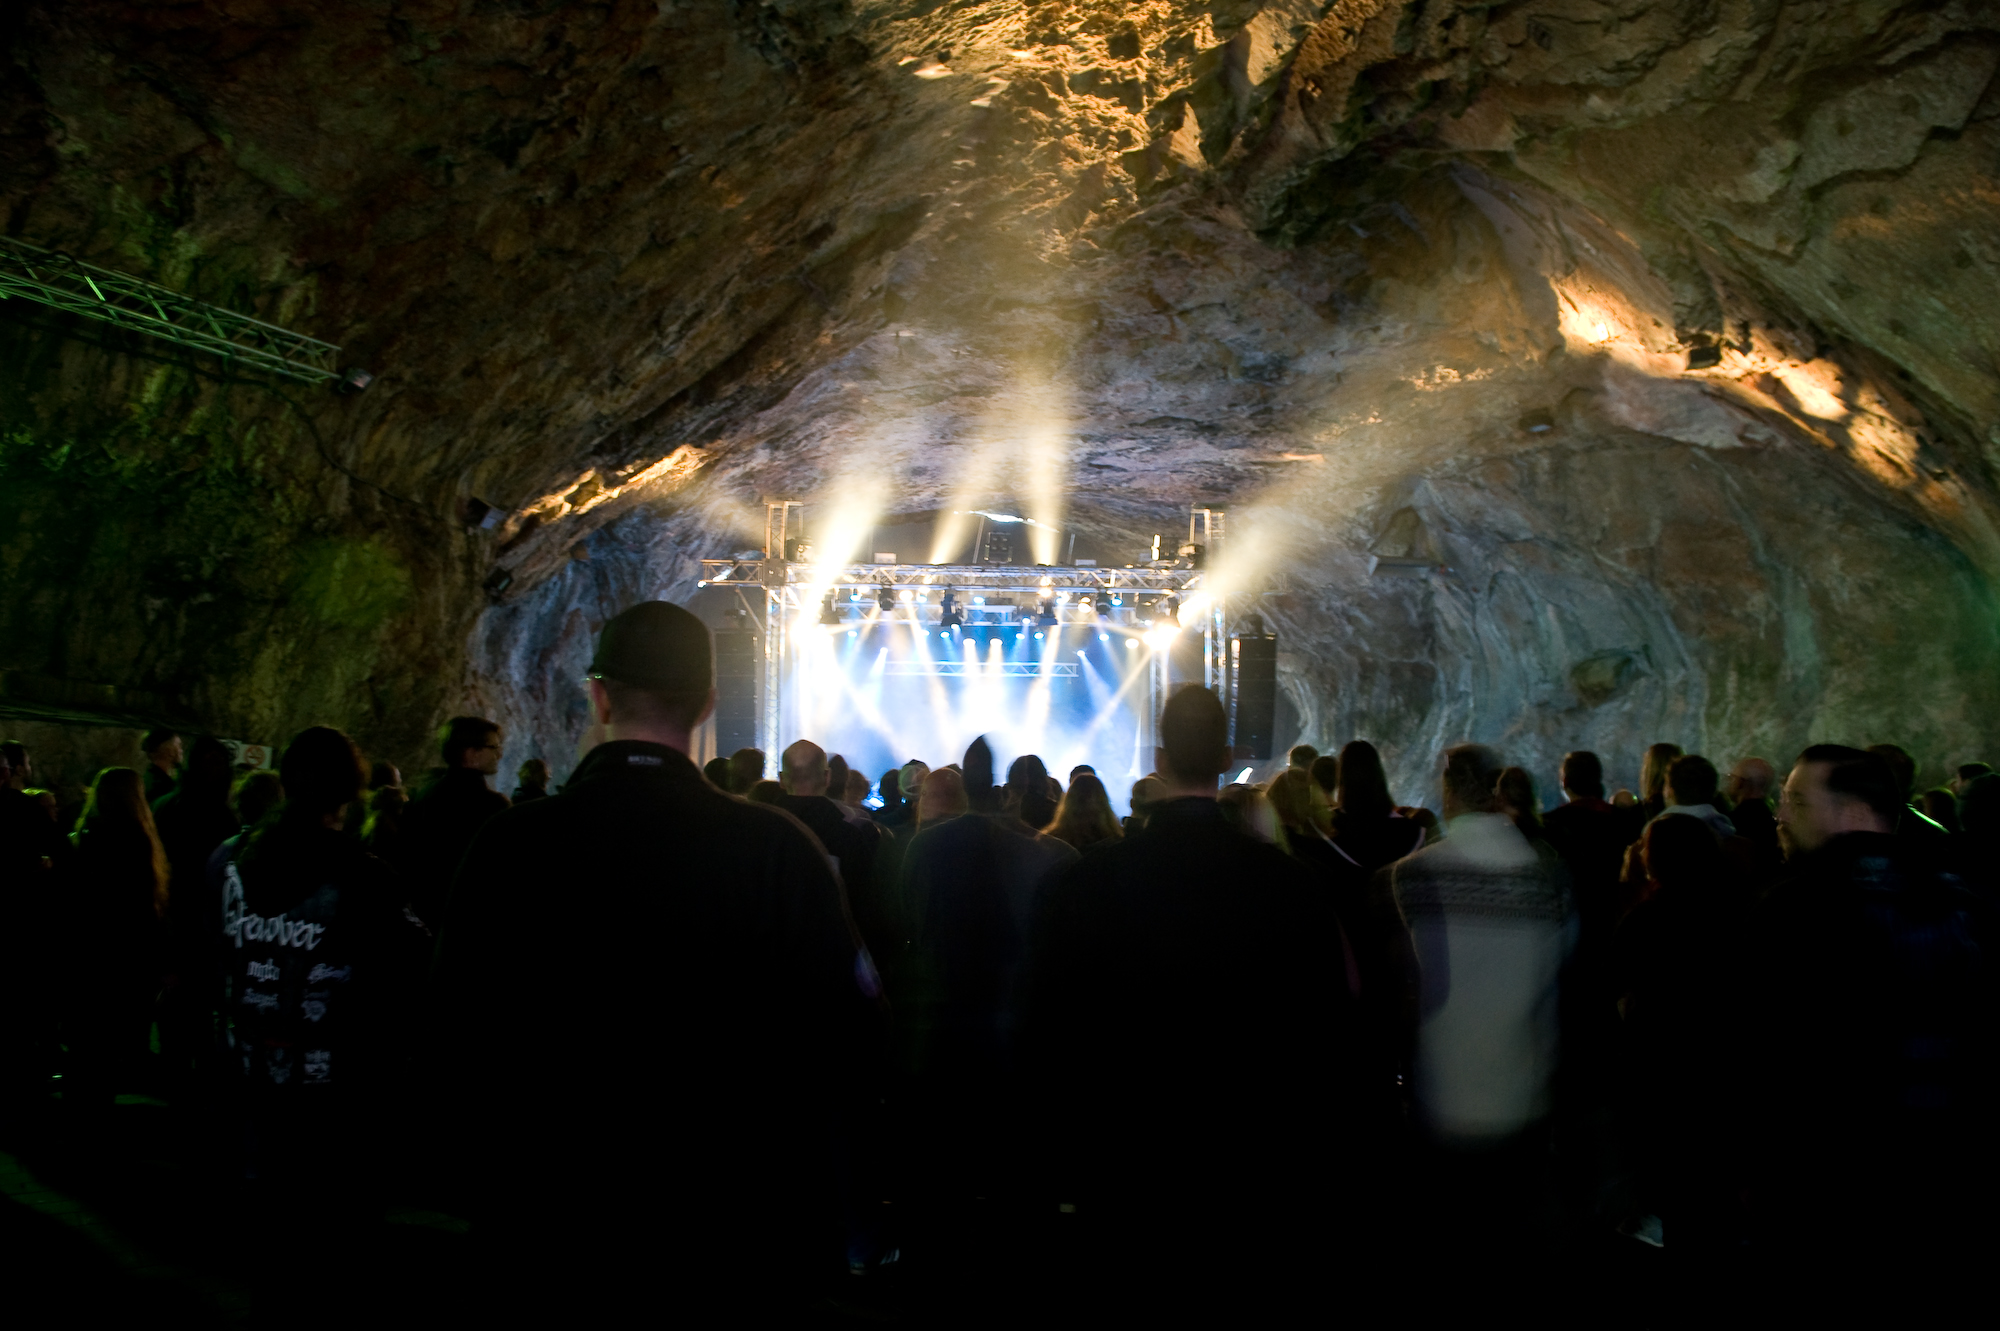 Höhle_ProphecyFest2015-7269